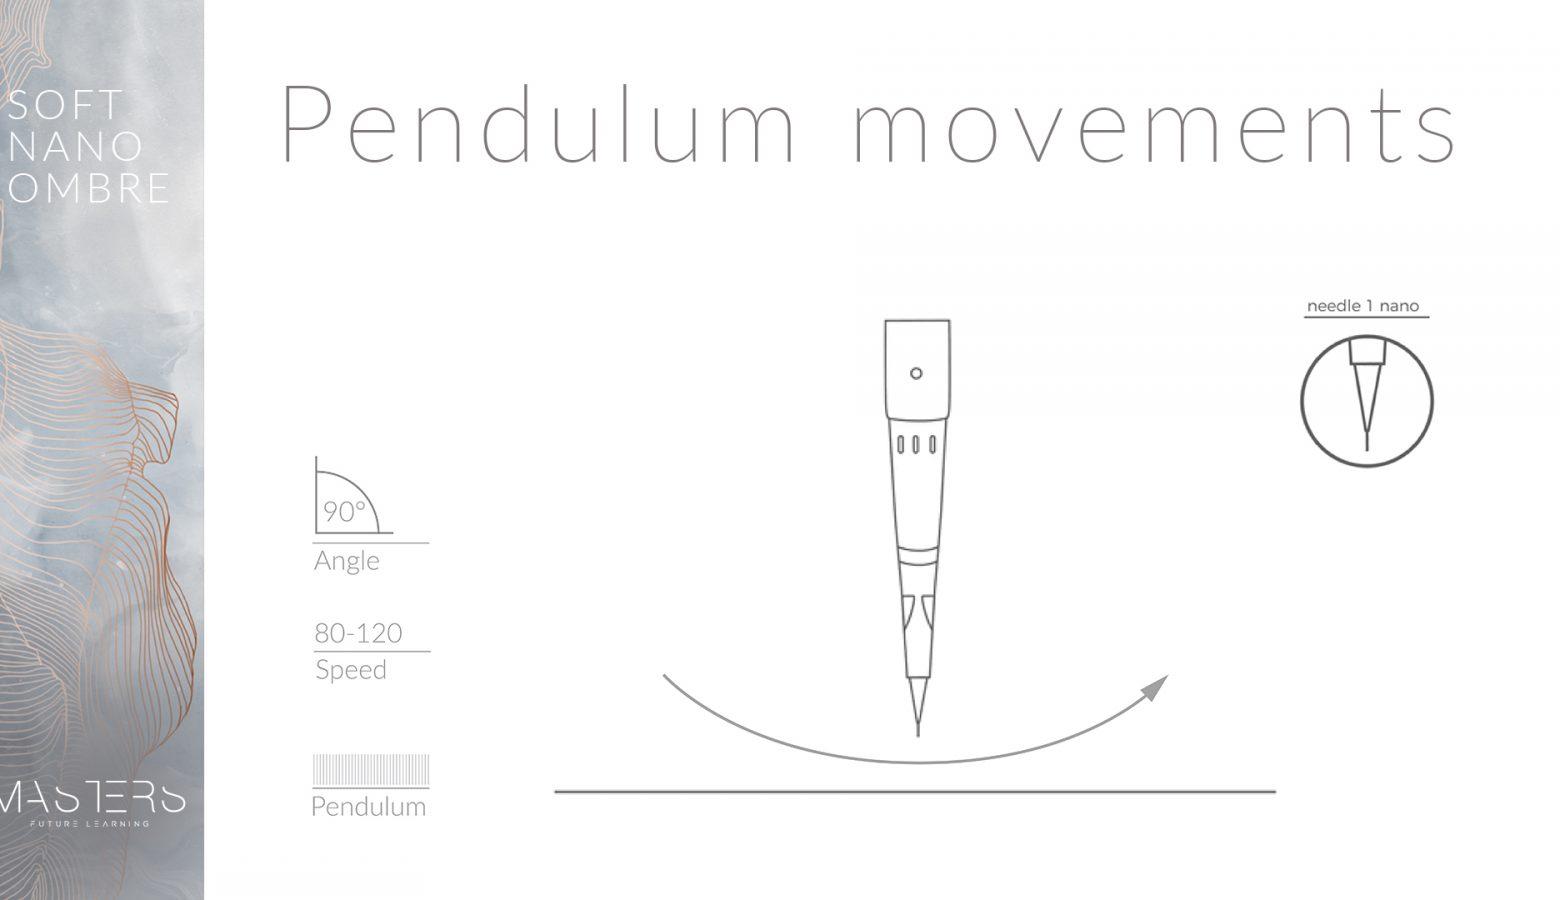 Pendulum movements